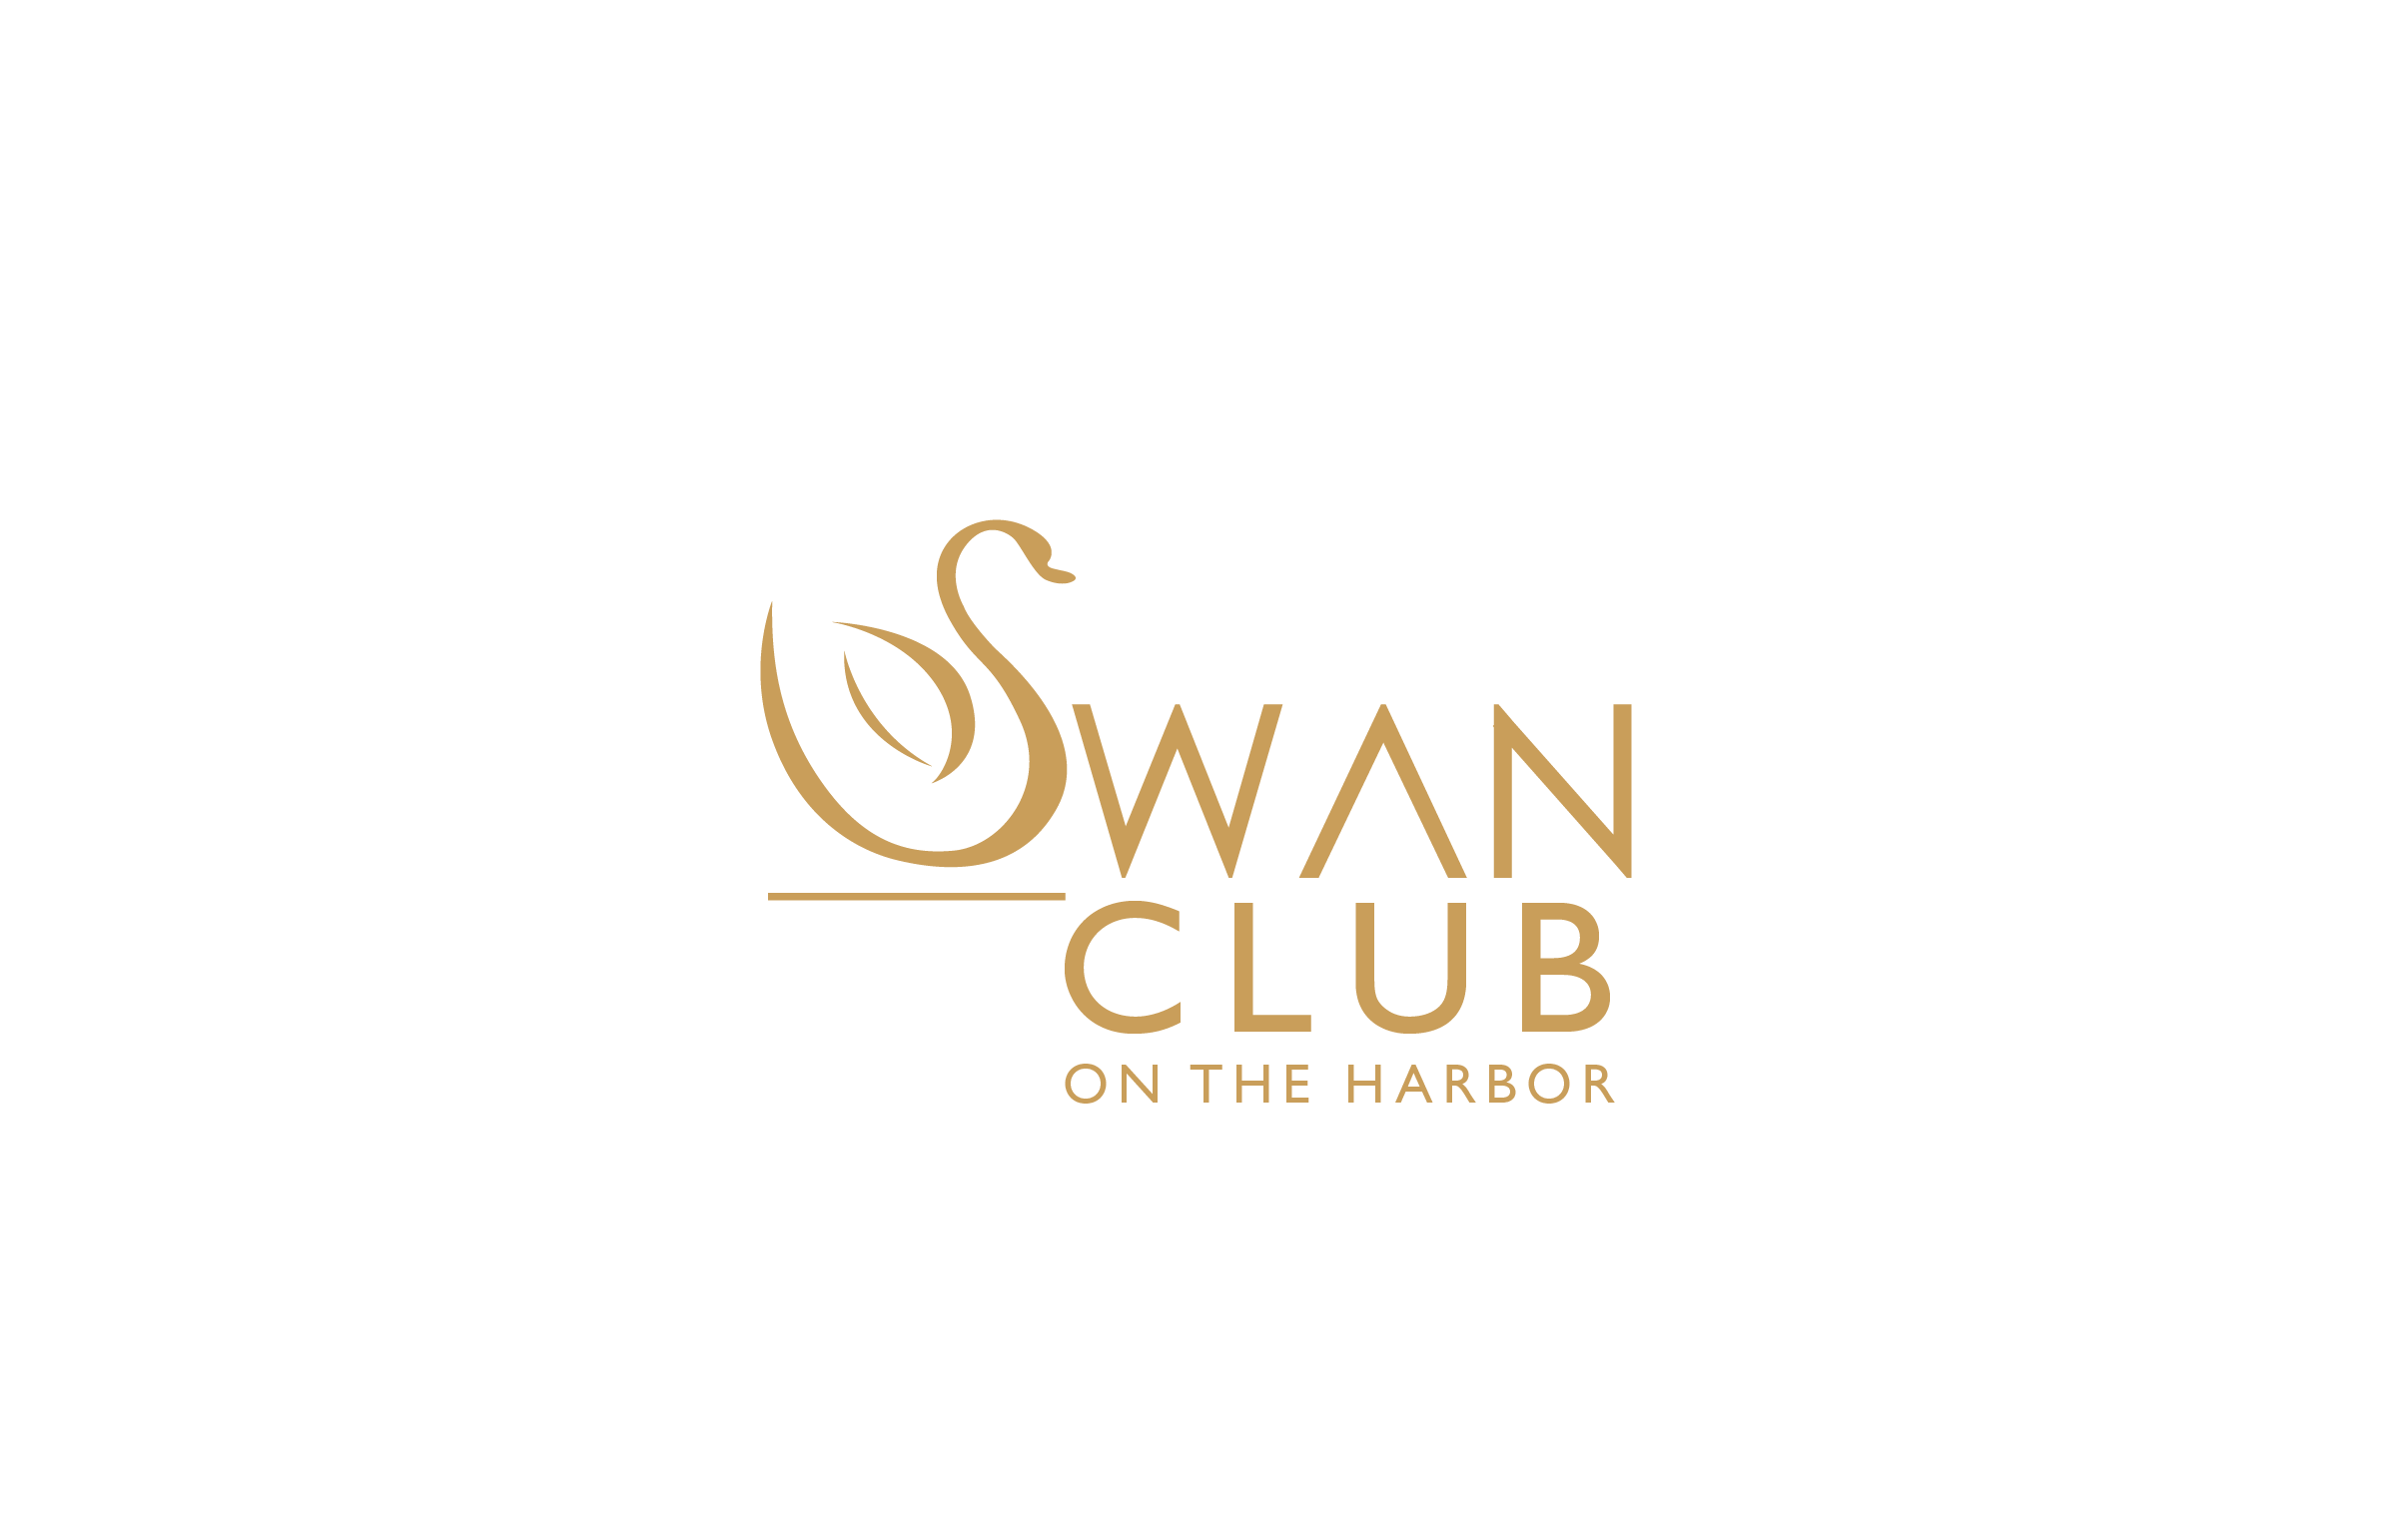 Swan Club On The Harbor